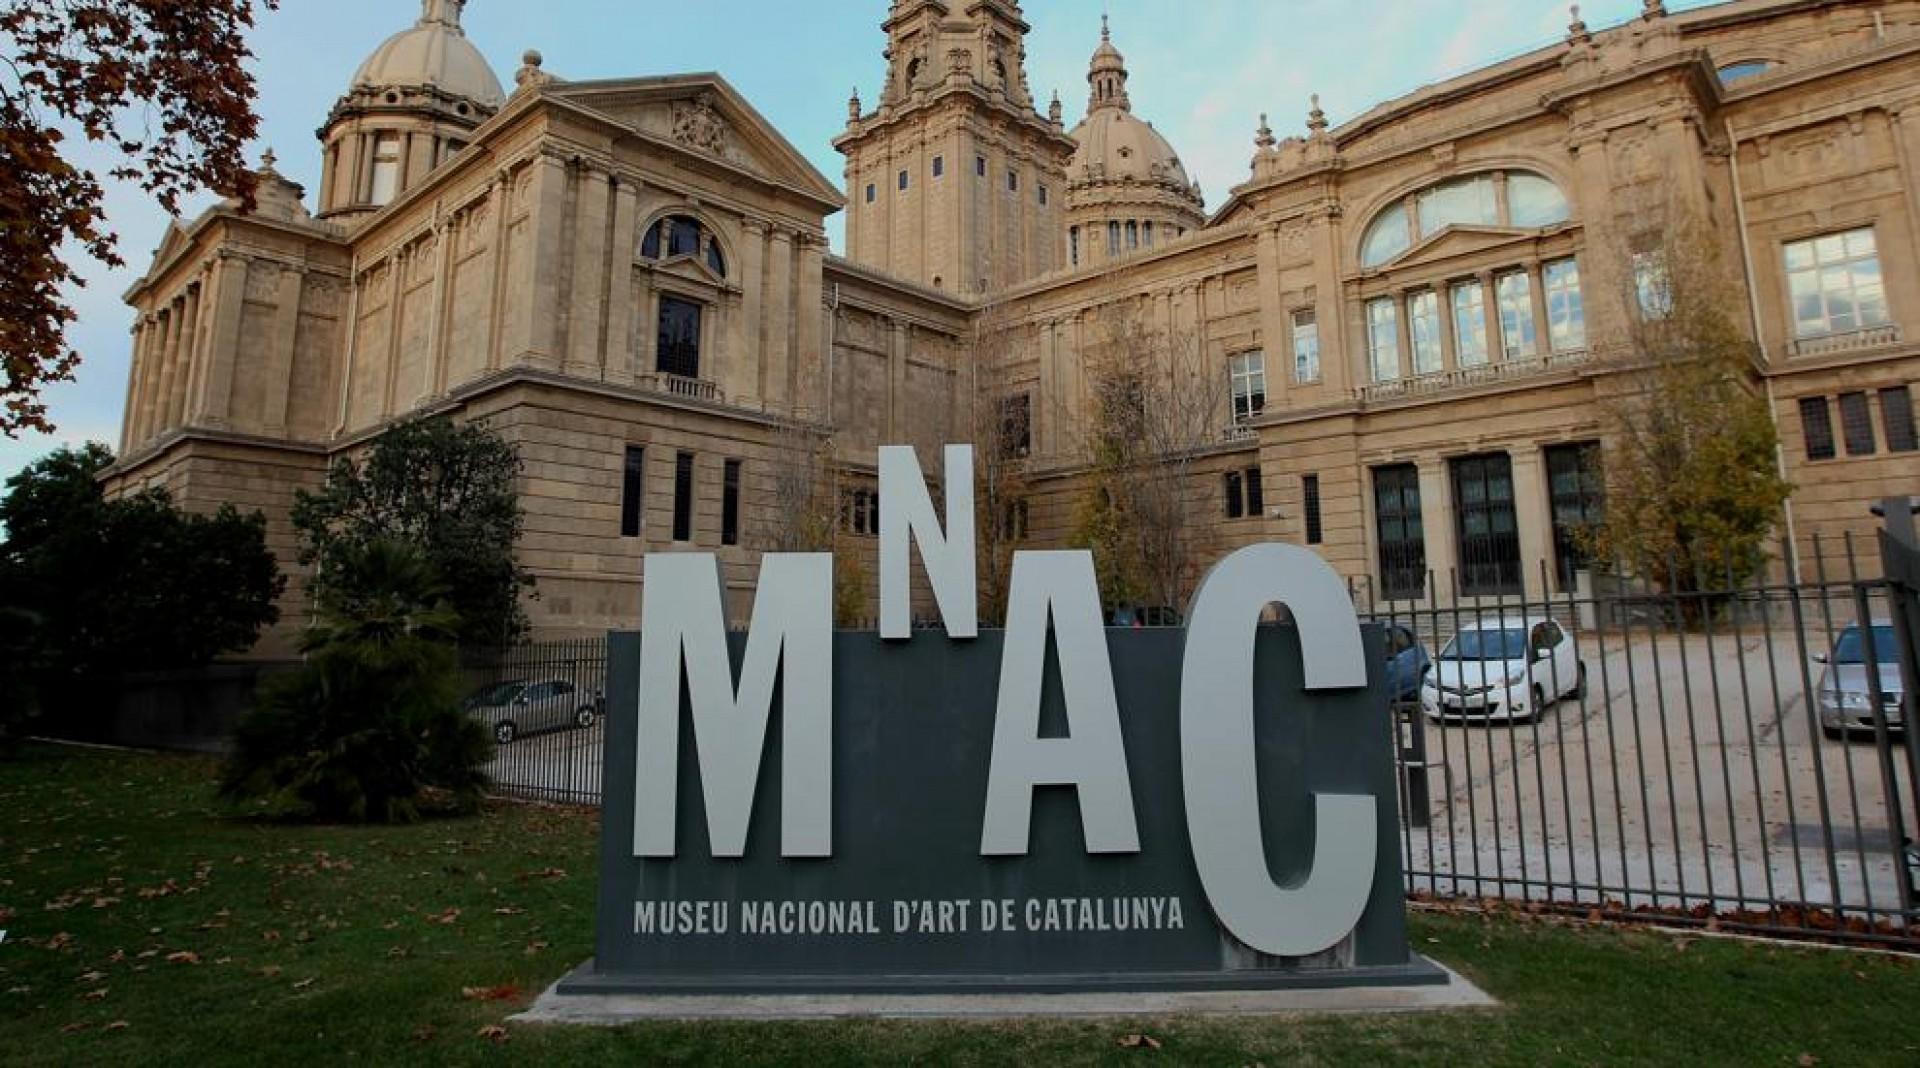 Museu nacional d'art de Catalunya ( MNAC )